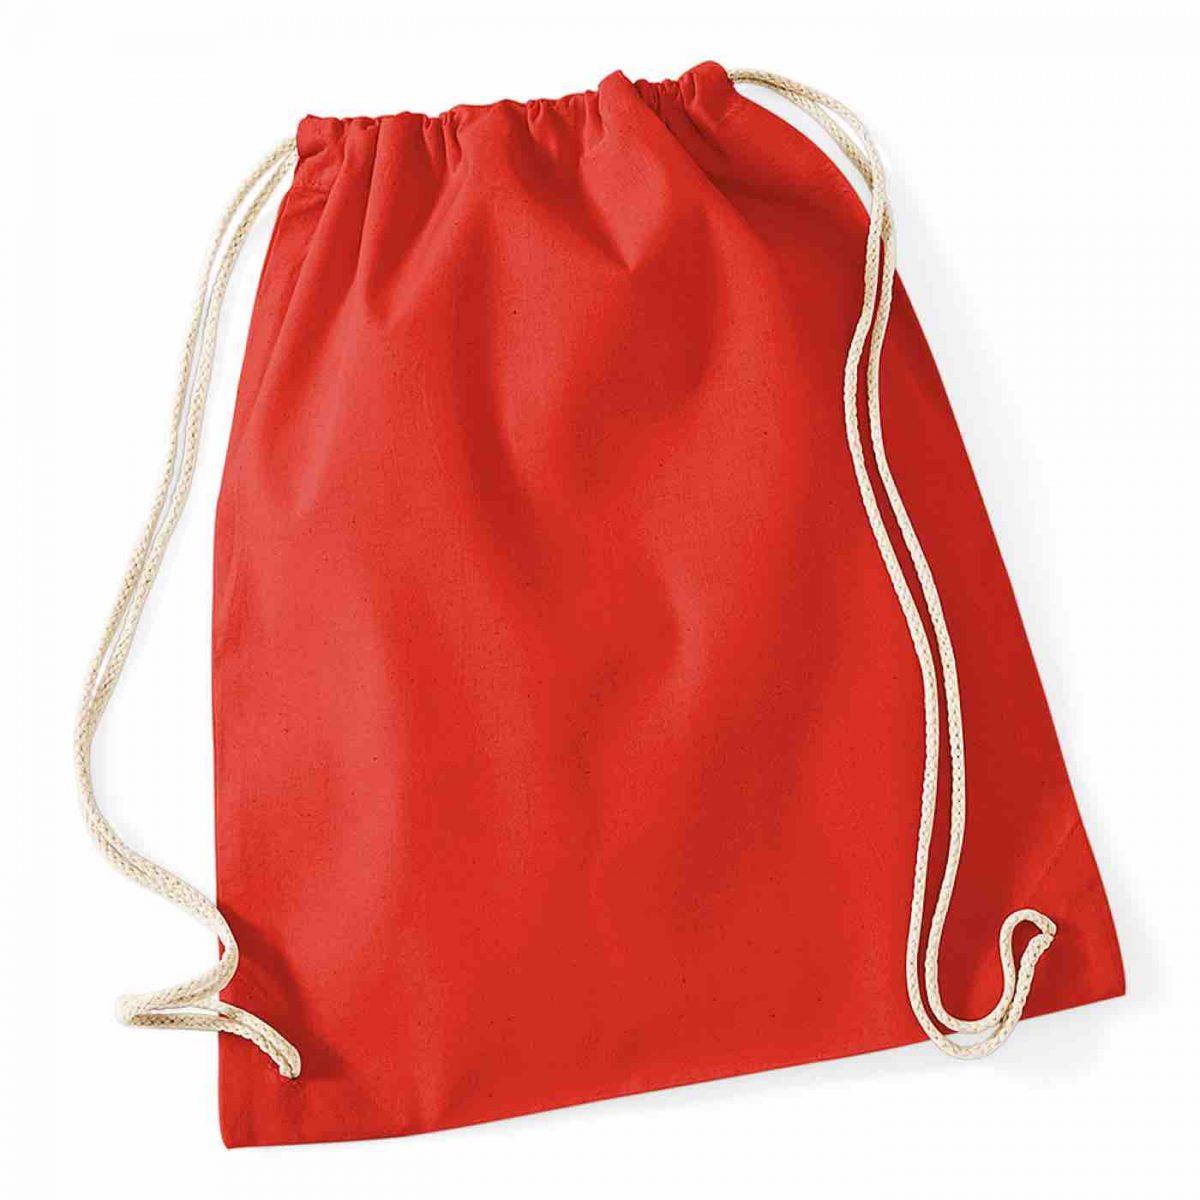 Bright Red Cotton Tote Bag